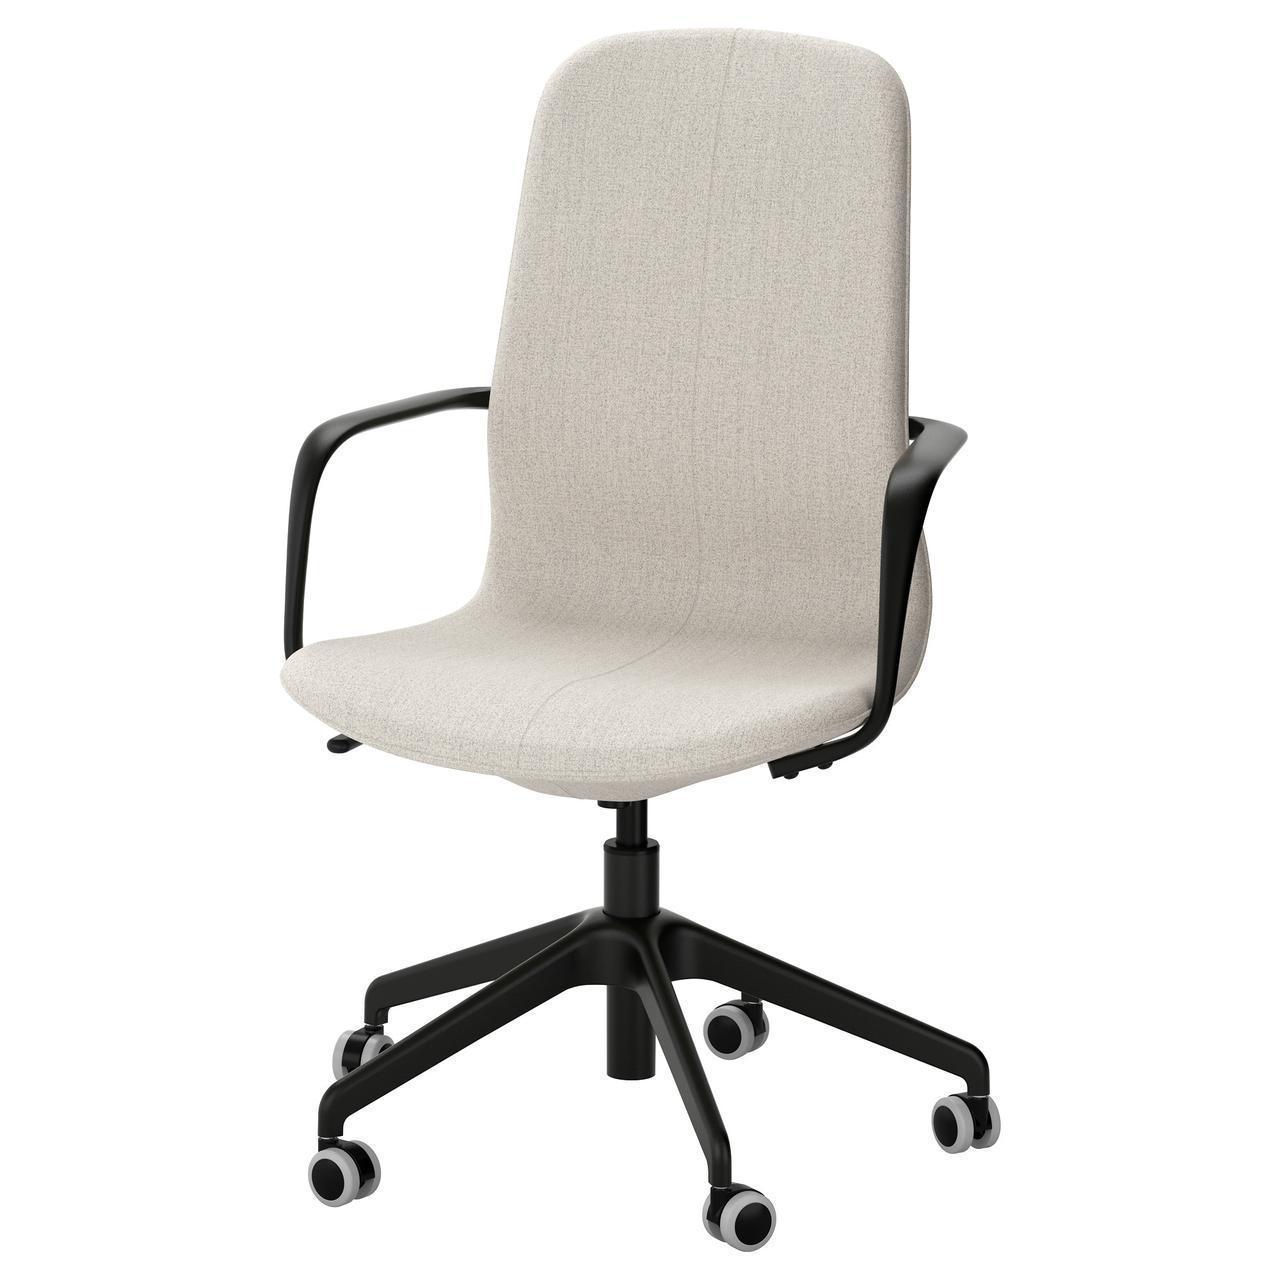 Компьютерное кресло IKEA LÅNGFJÄLL Gunnared бежевое черное 291.780.69